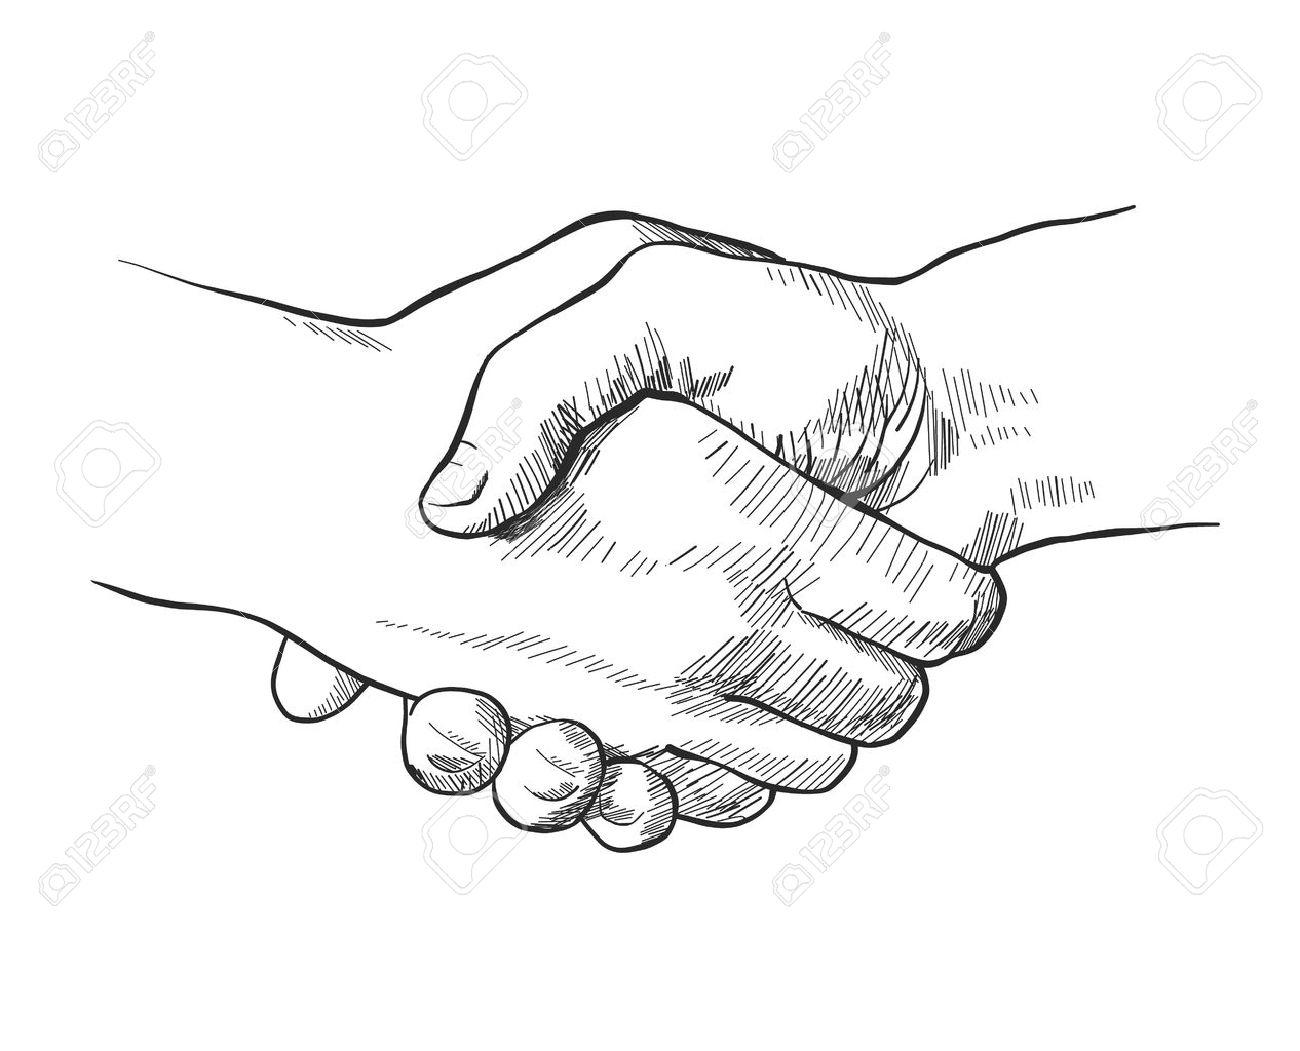 1300x1051 Hand Drawn Sketch Illustration Of A Handshake Royalty Free